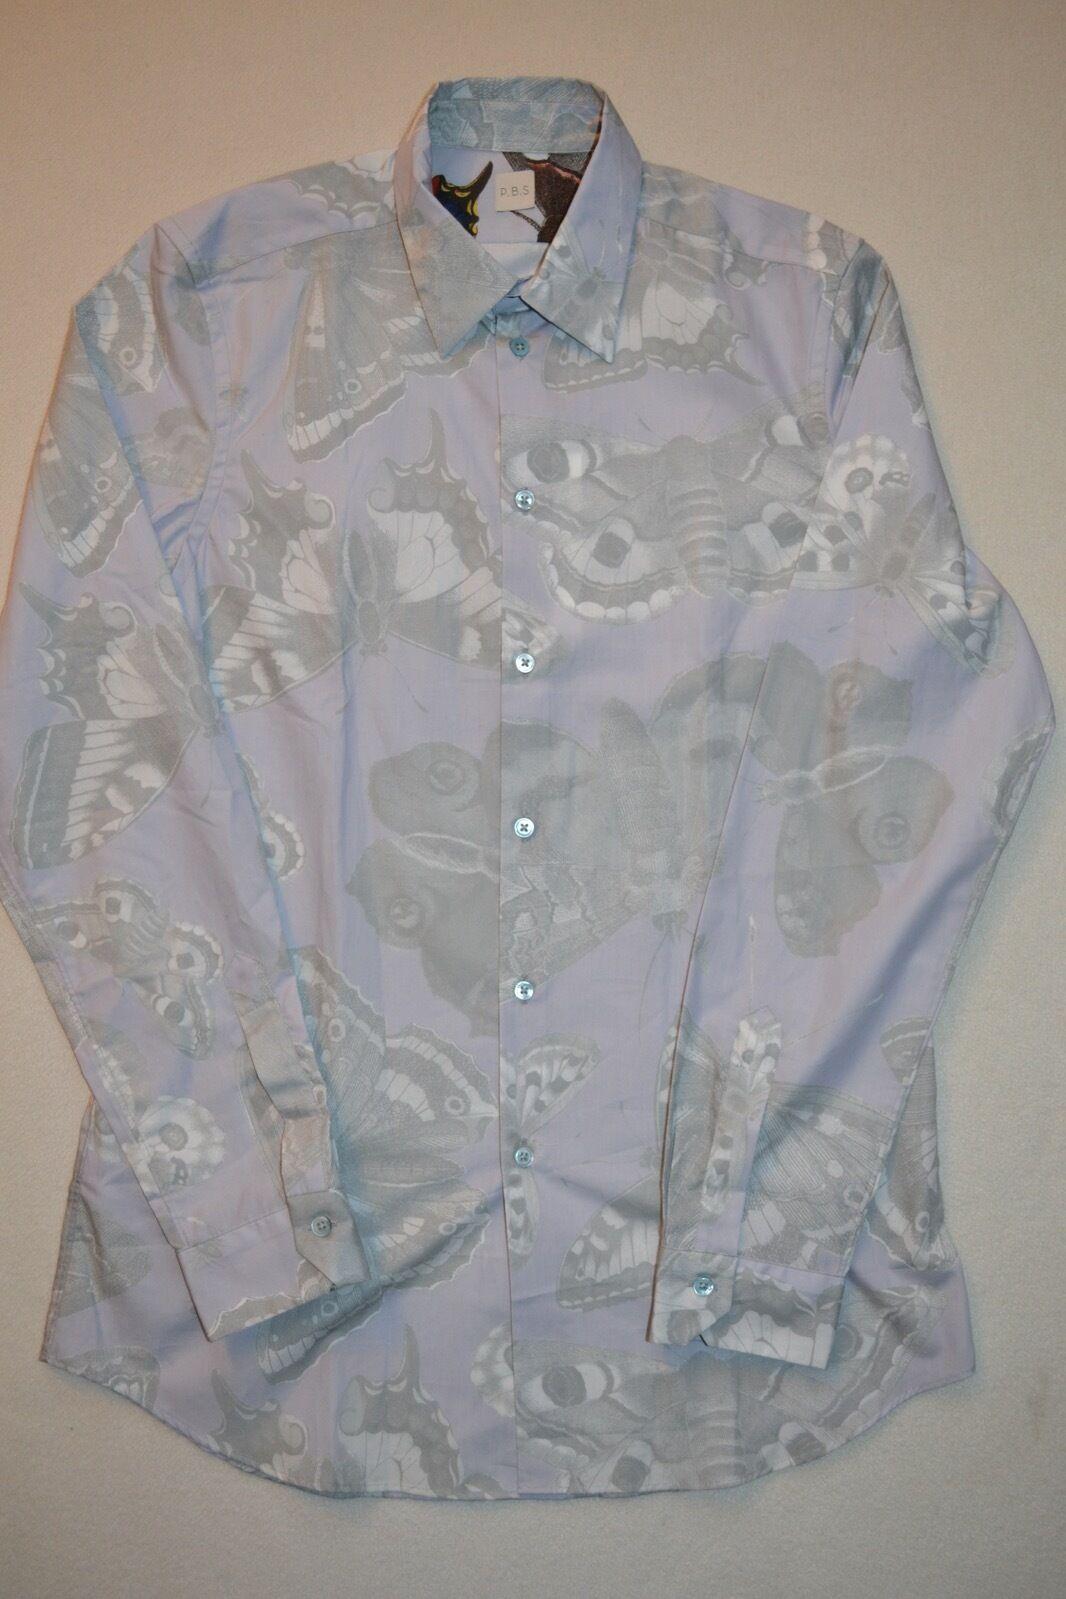 Paul Smith PBS Butterfly Butterfly Butterfly Print Shirt M NEW     | Modern Und Elegant In Der Mode  3e0535